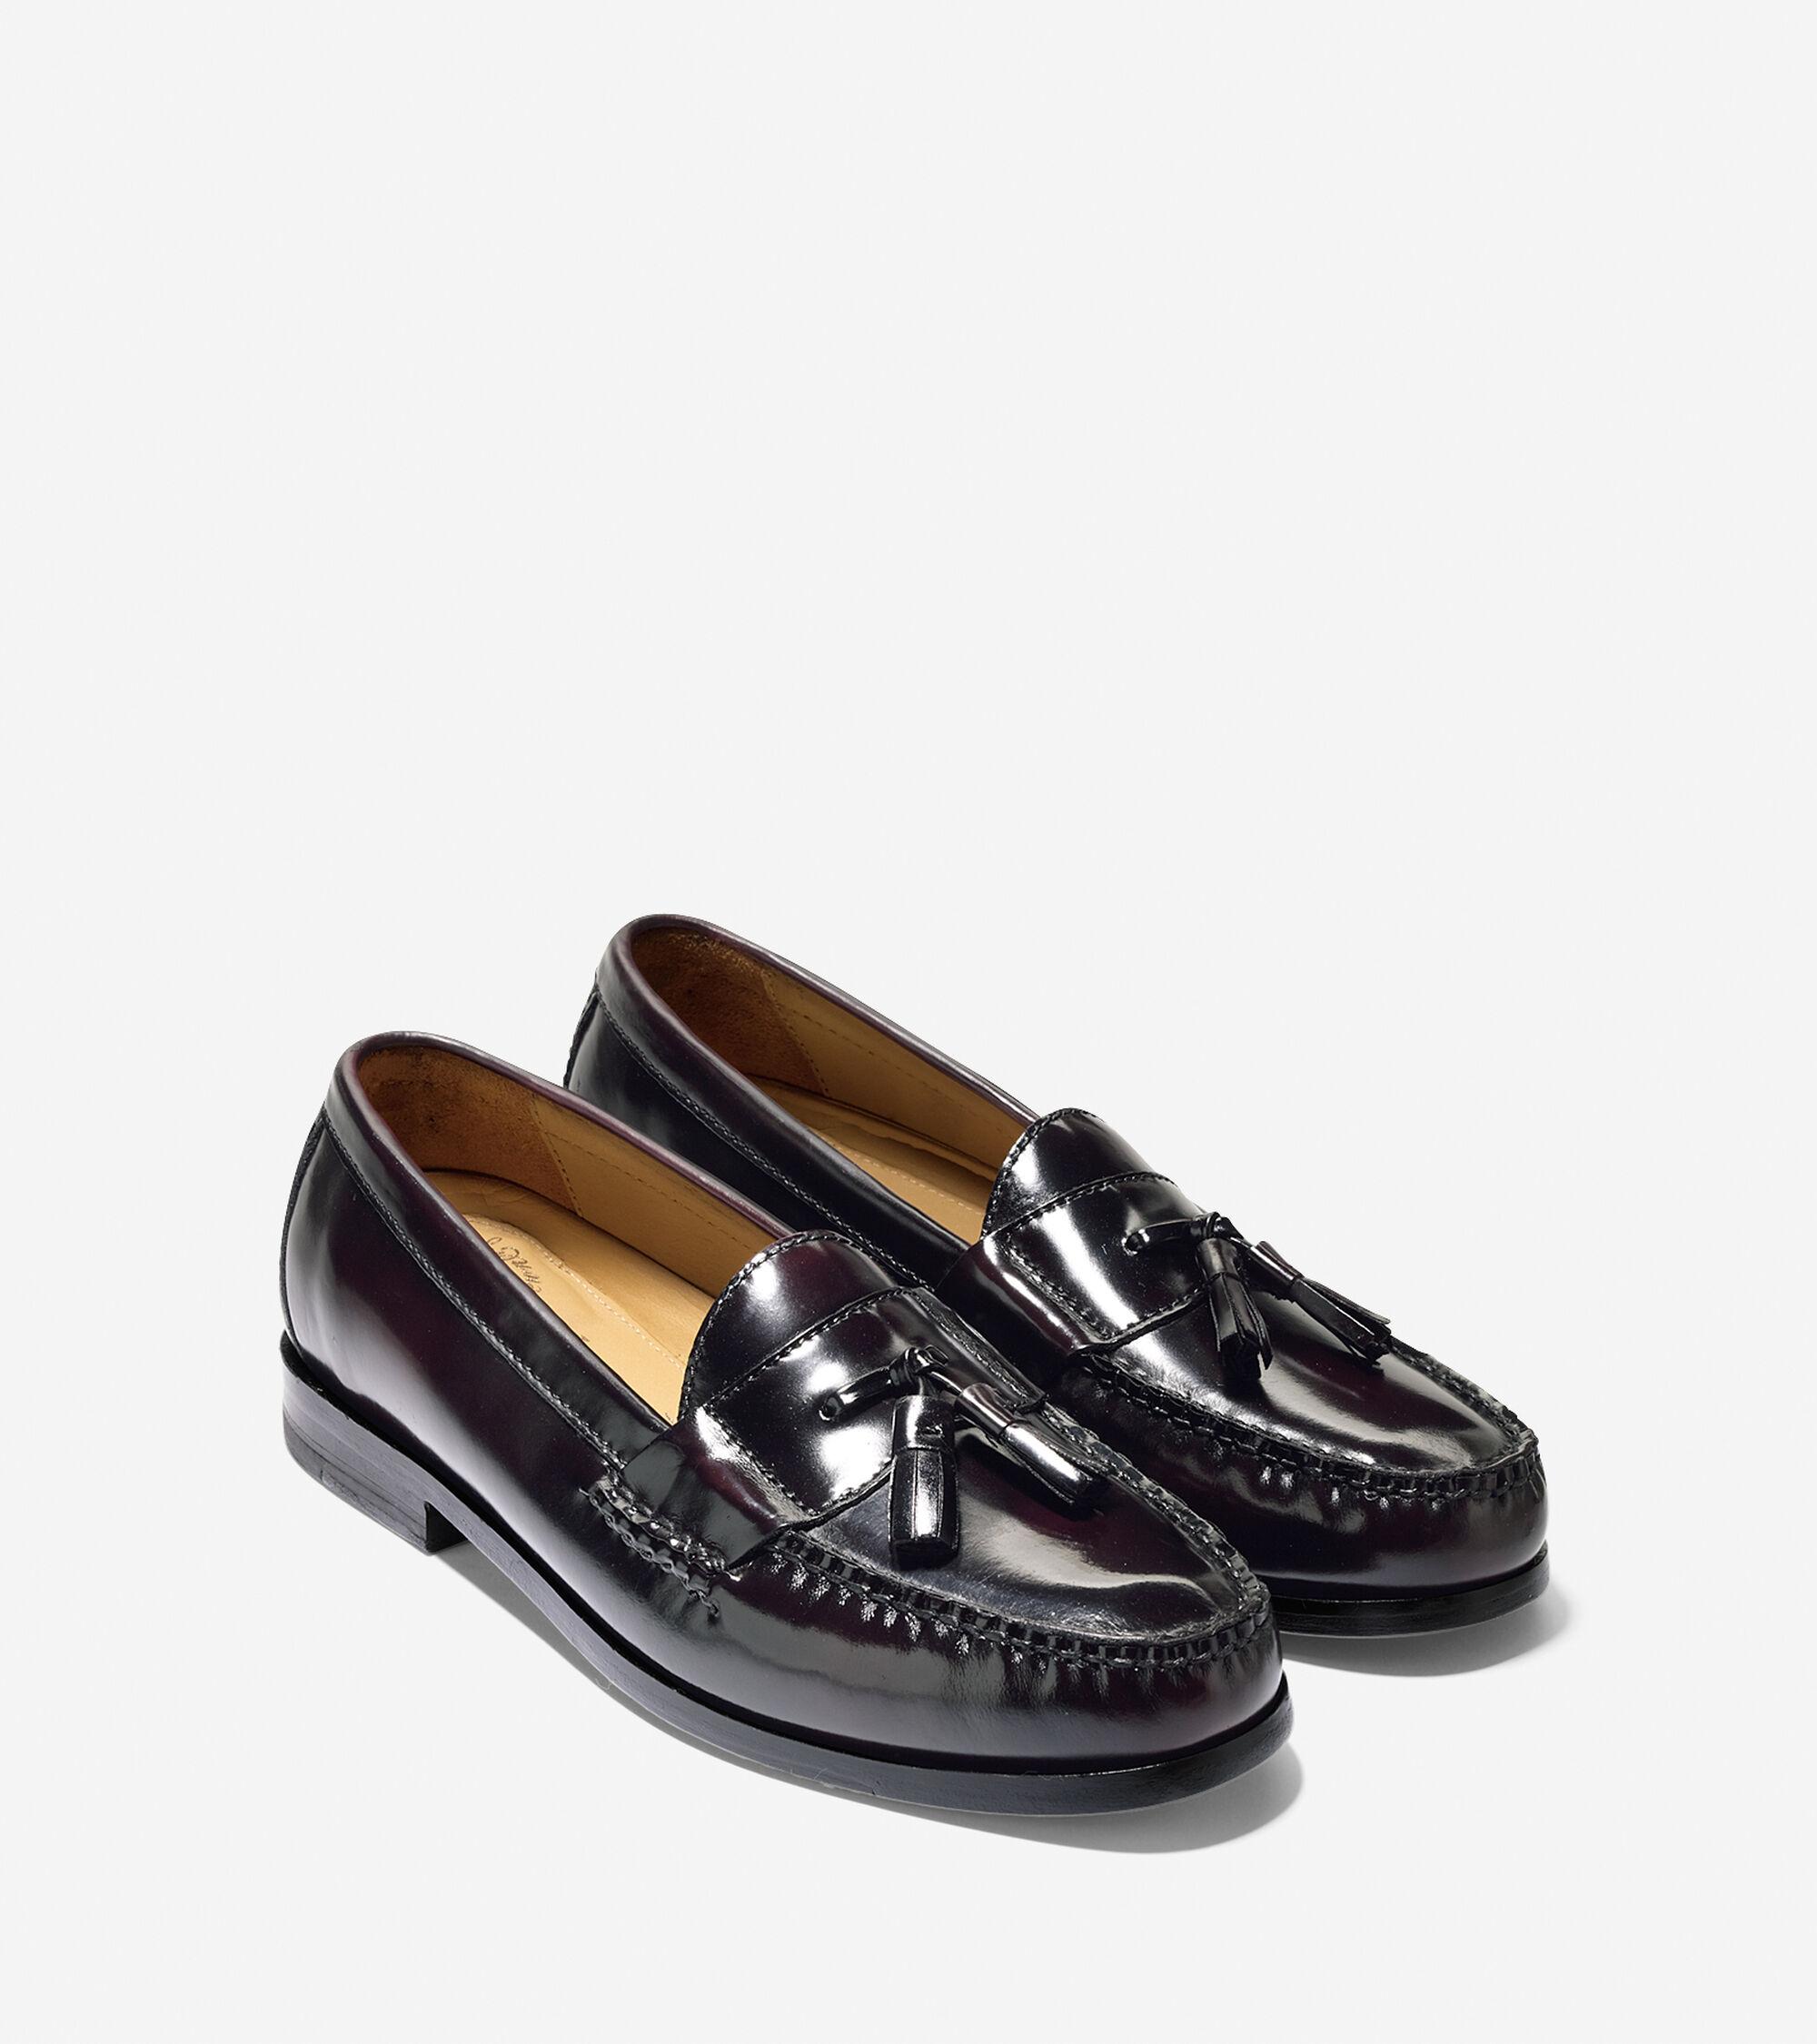 65608783f6e Pinch Grand Tassel In Burgundy   Mens Shoes